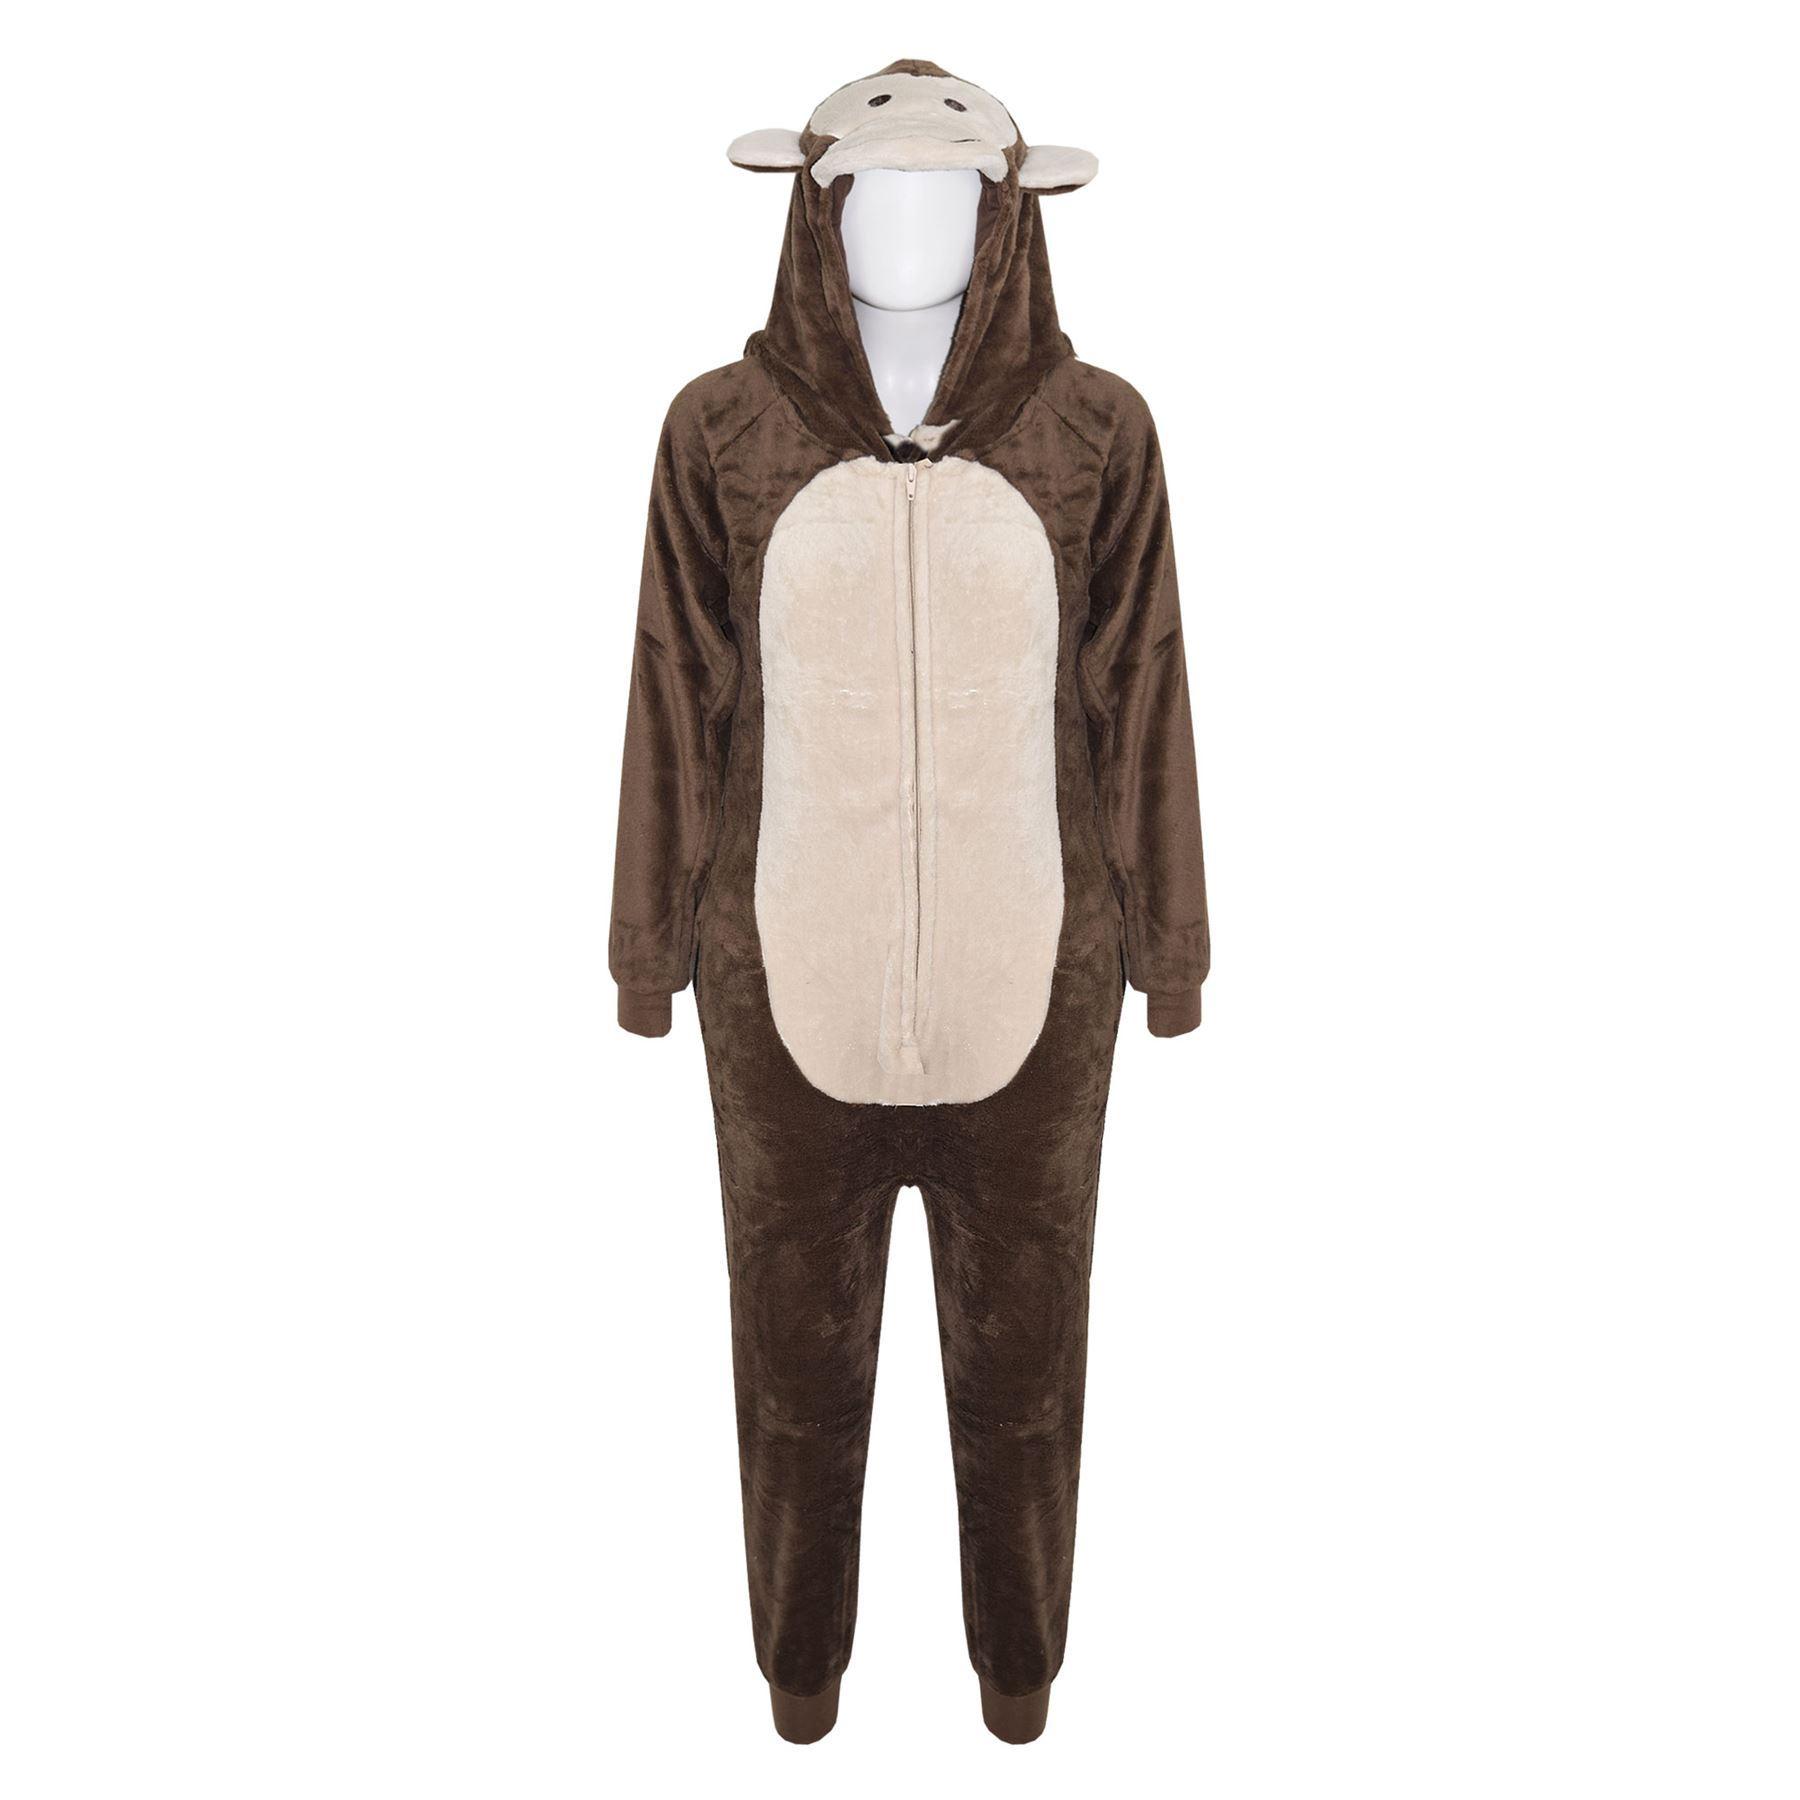 Fleece Jumpsuit Onesie Costume Astronaut Onesie Boys Girls Nasa Boys Pyjamas